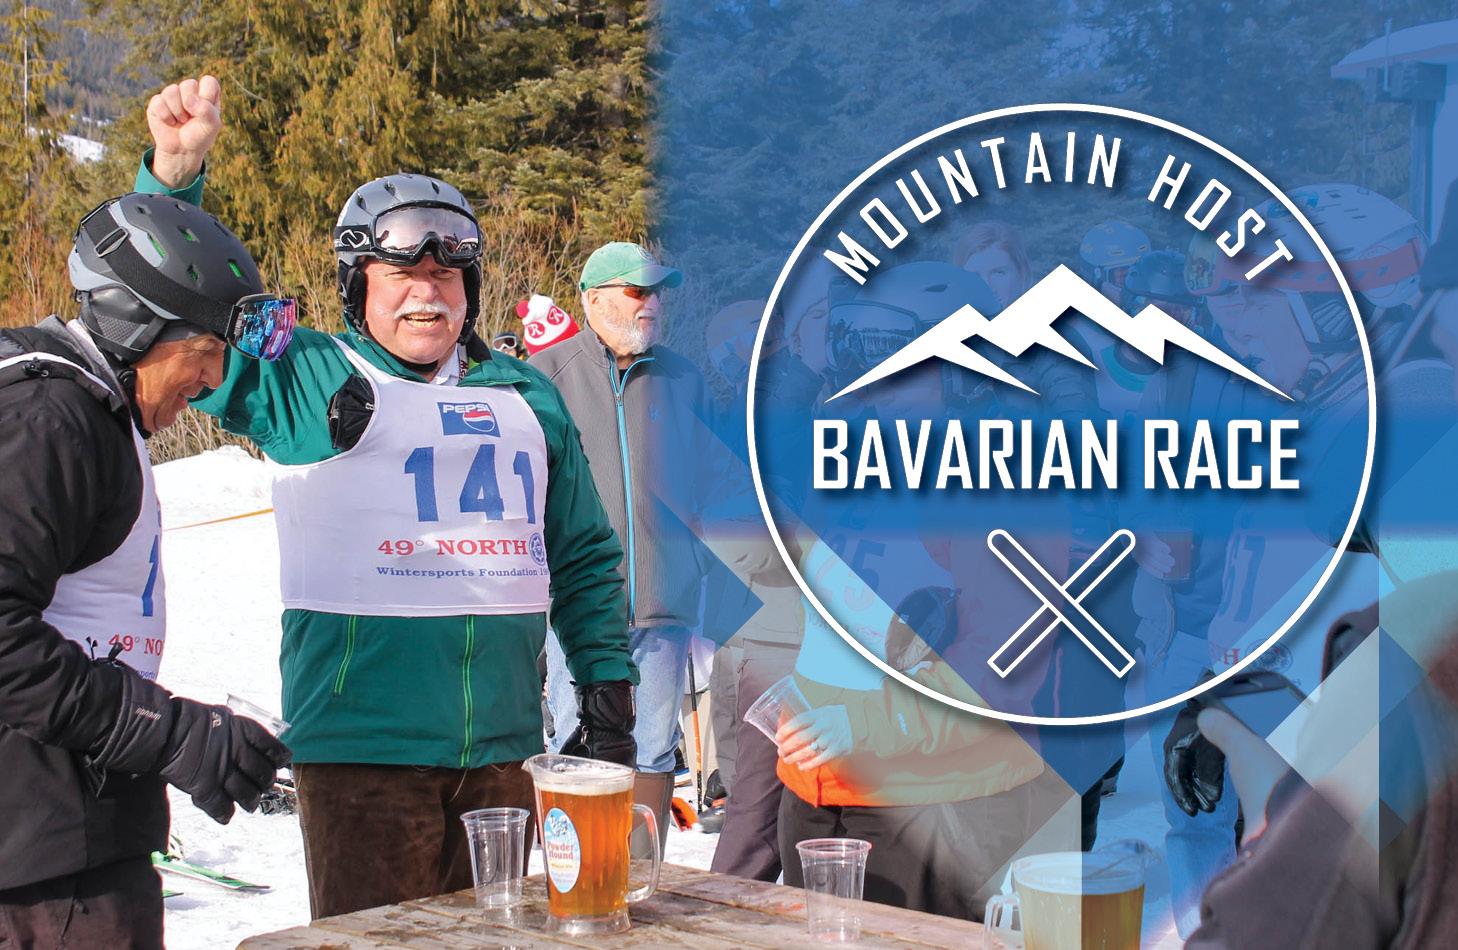 Bavarian Race